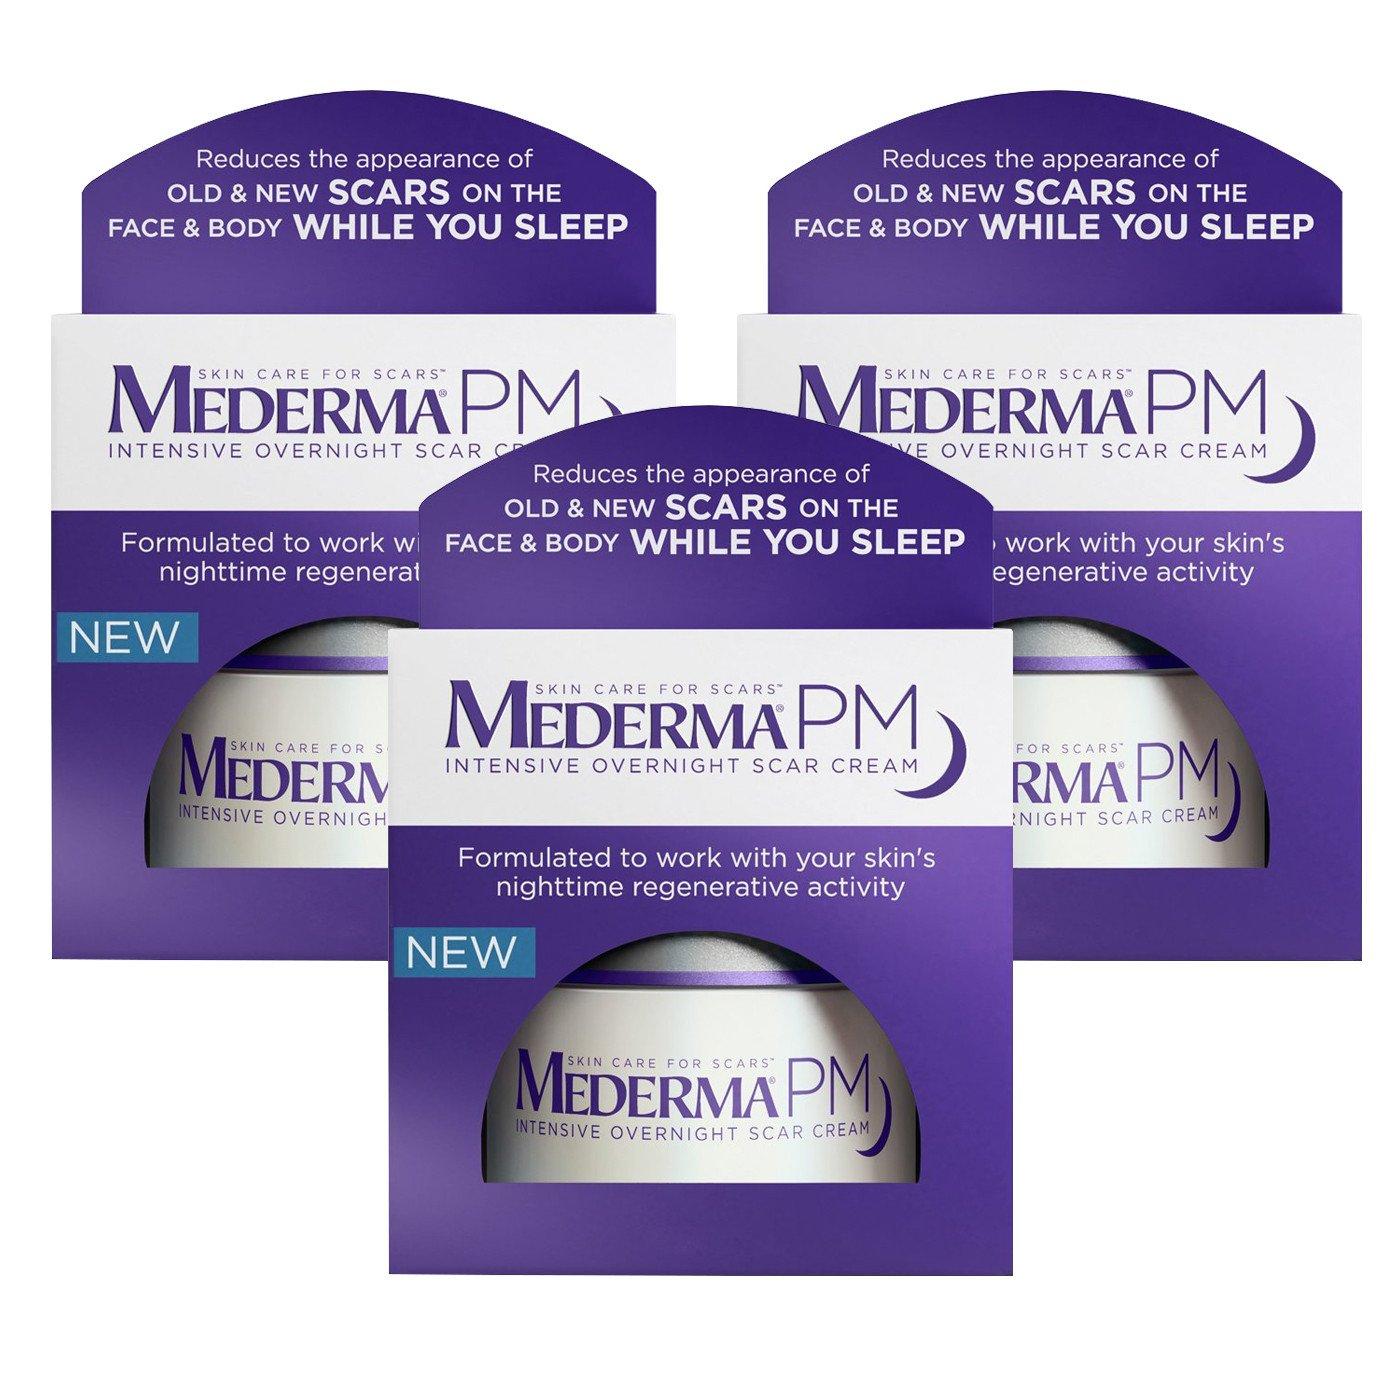 Mederma PM Intensive Overnight Scar Cream 1.7 oz by Mederma …